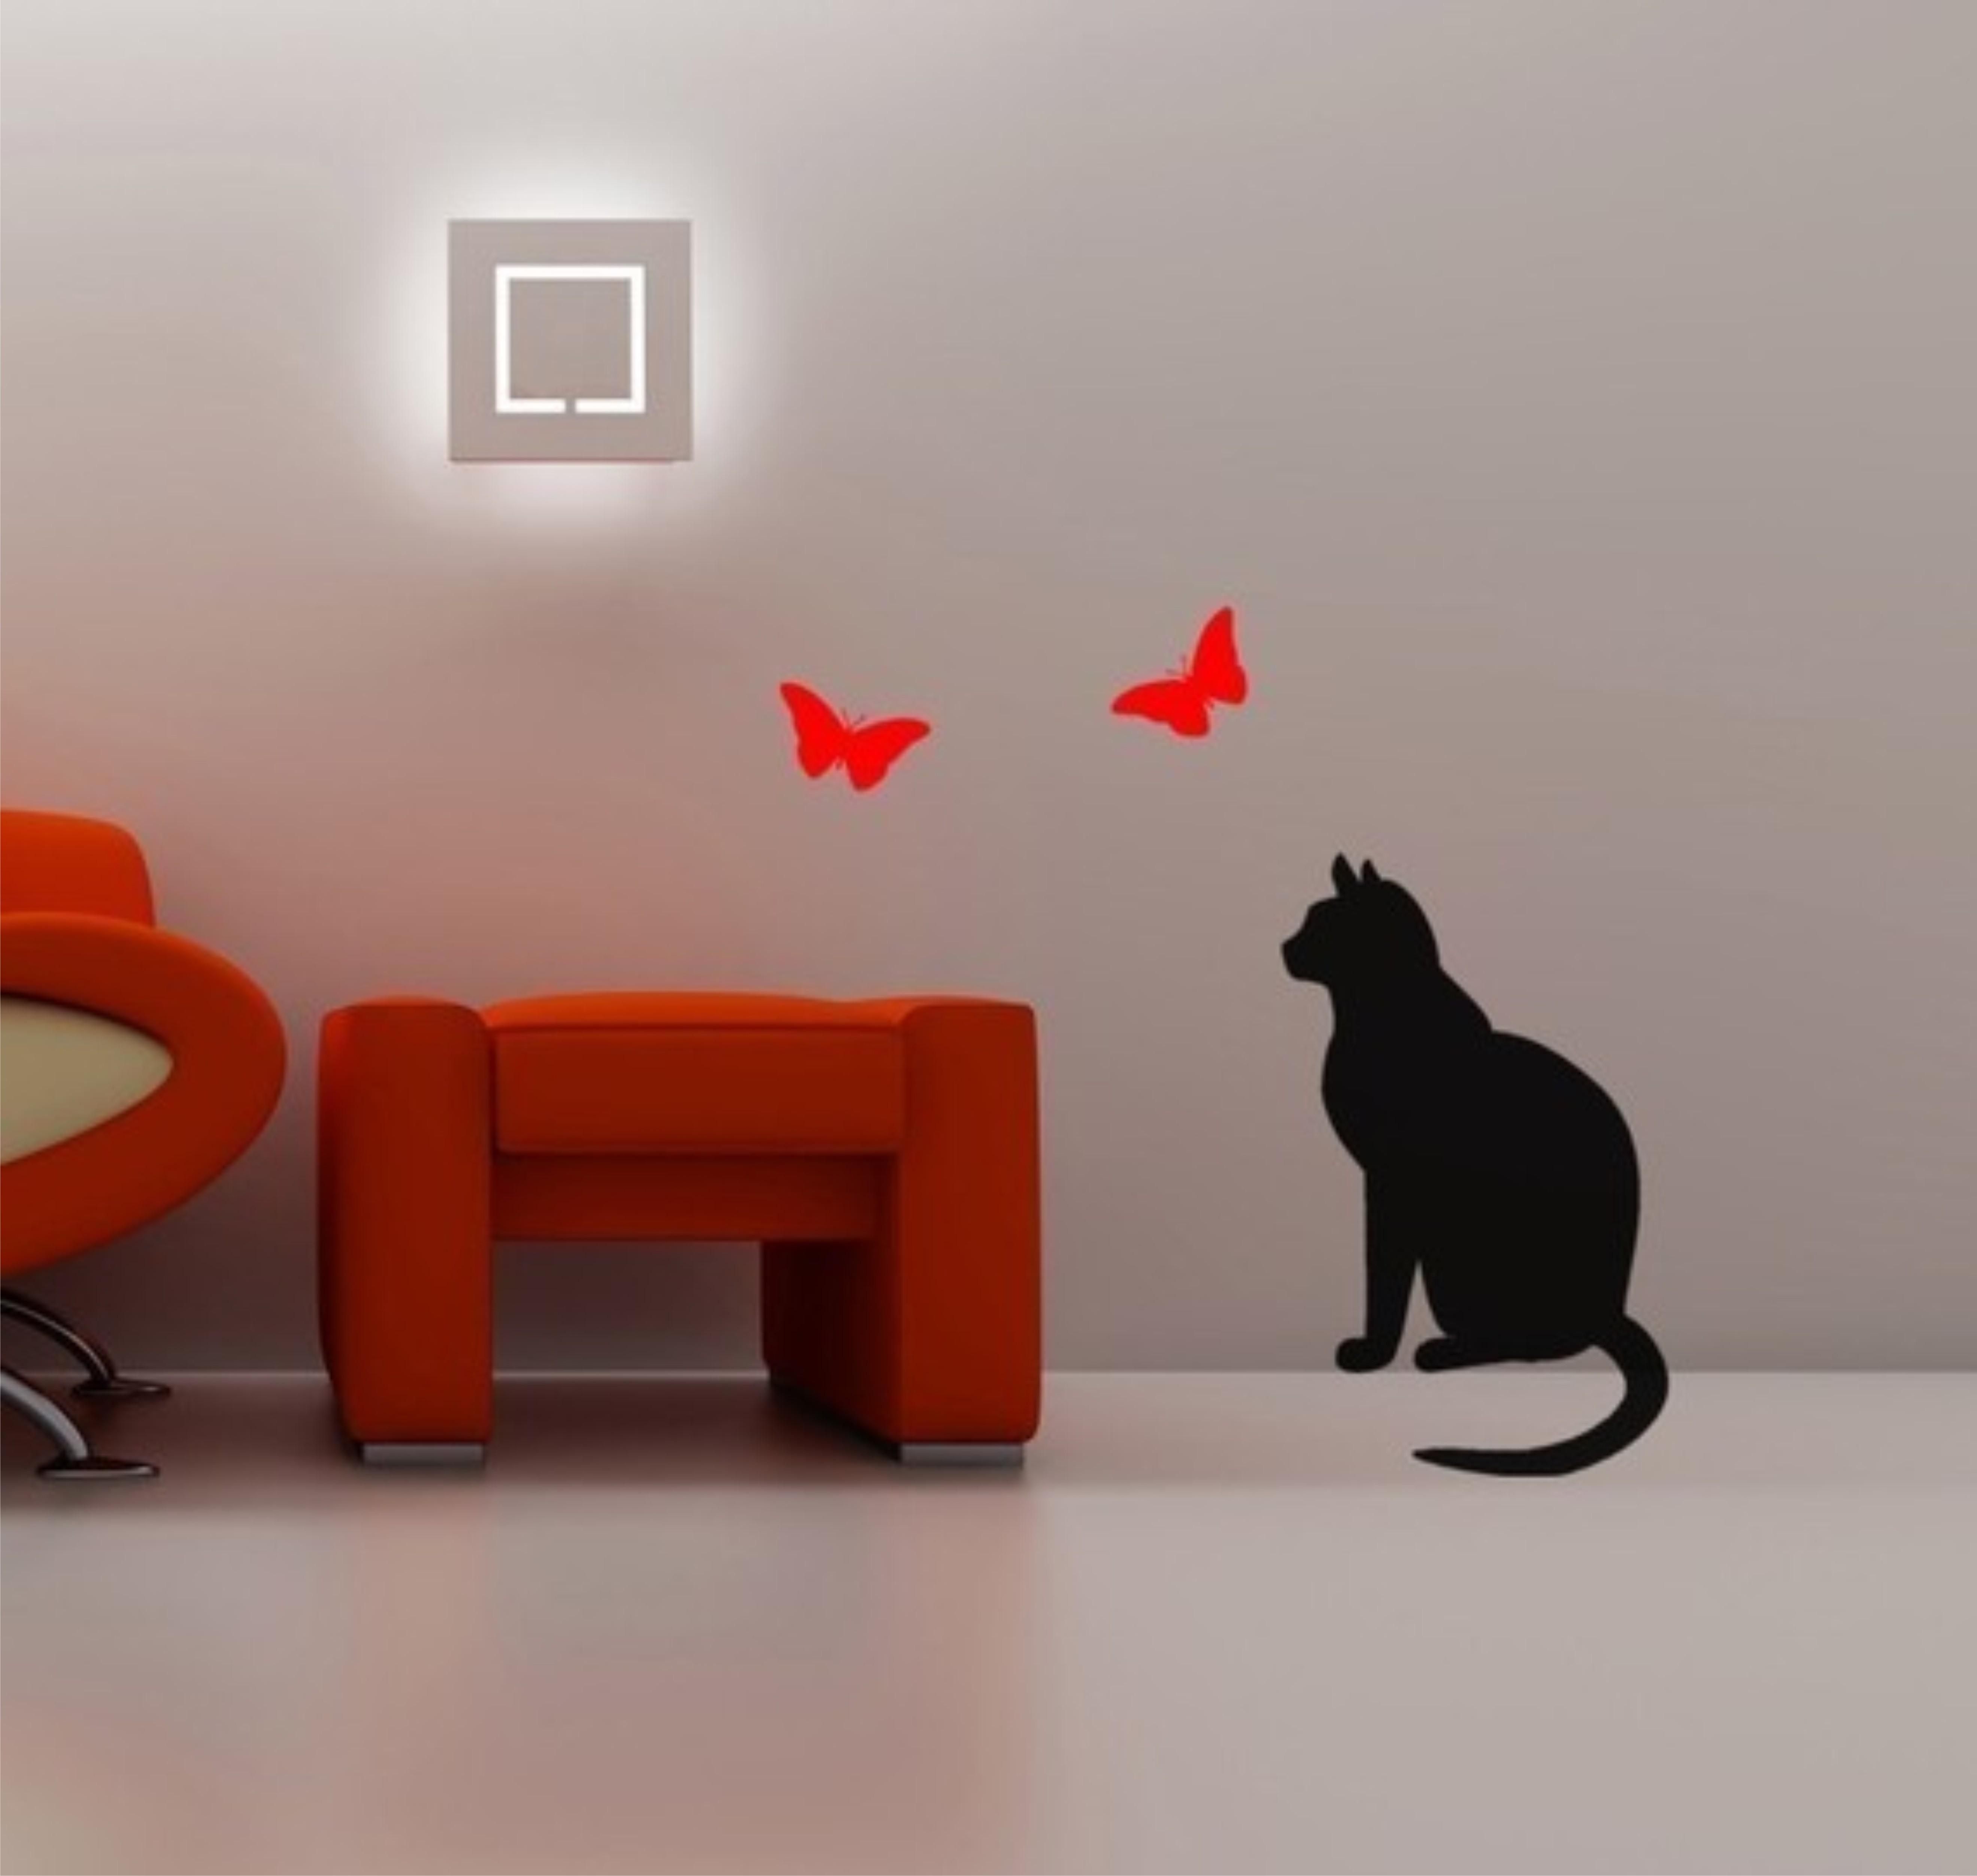 Armario Para Consultorio Odontologico Com Pia ~ Adesivo decoraç u00e3o parede gato borboletas Adesivos de